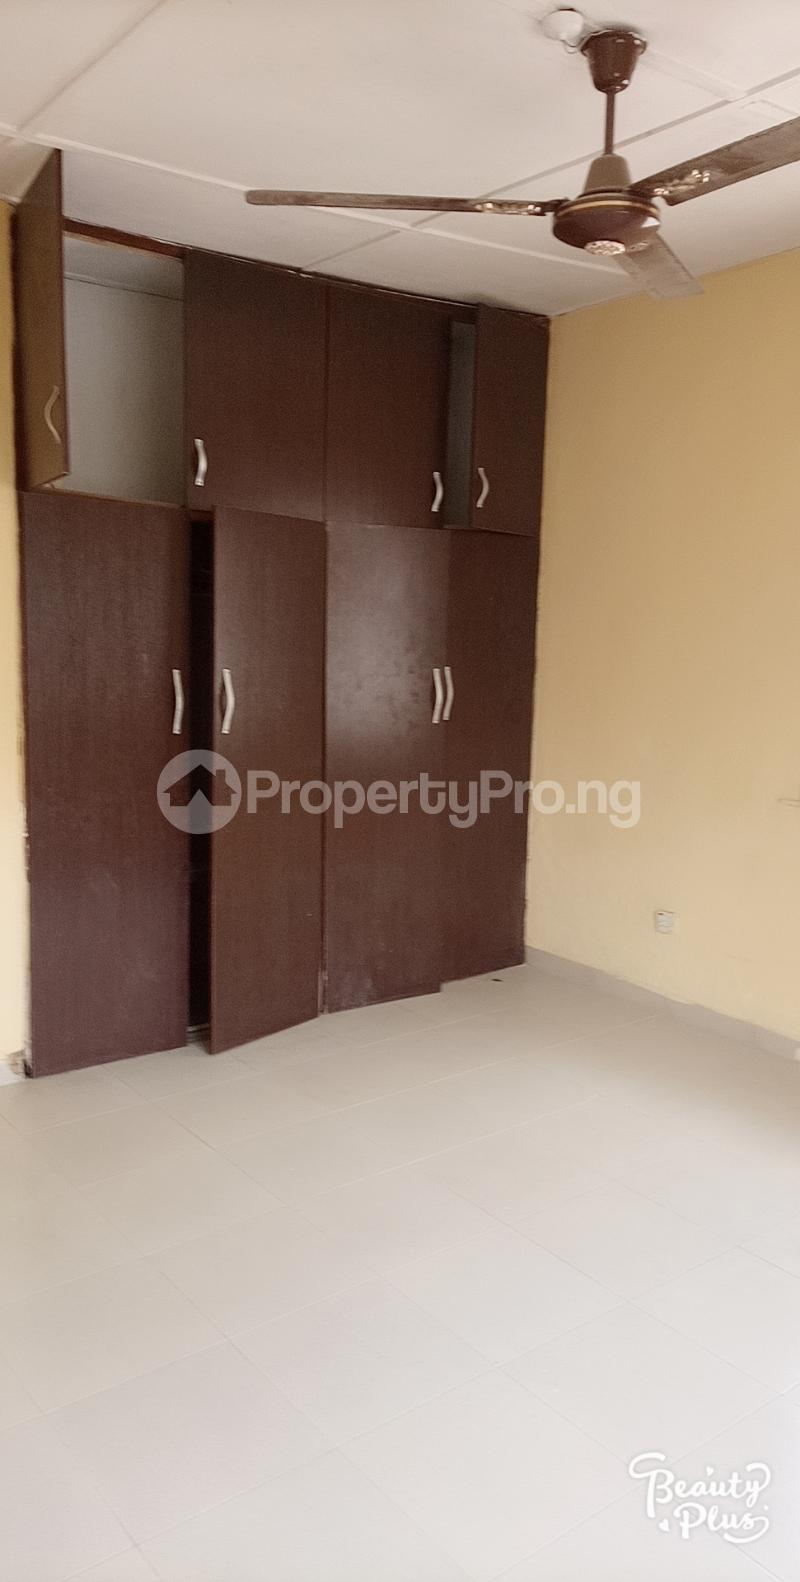 5 bedroom Semi Detached Duplex House for sale Ajao estate Isolo. Lagos Ajao Estate Isolo Lagos - 3